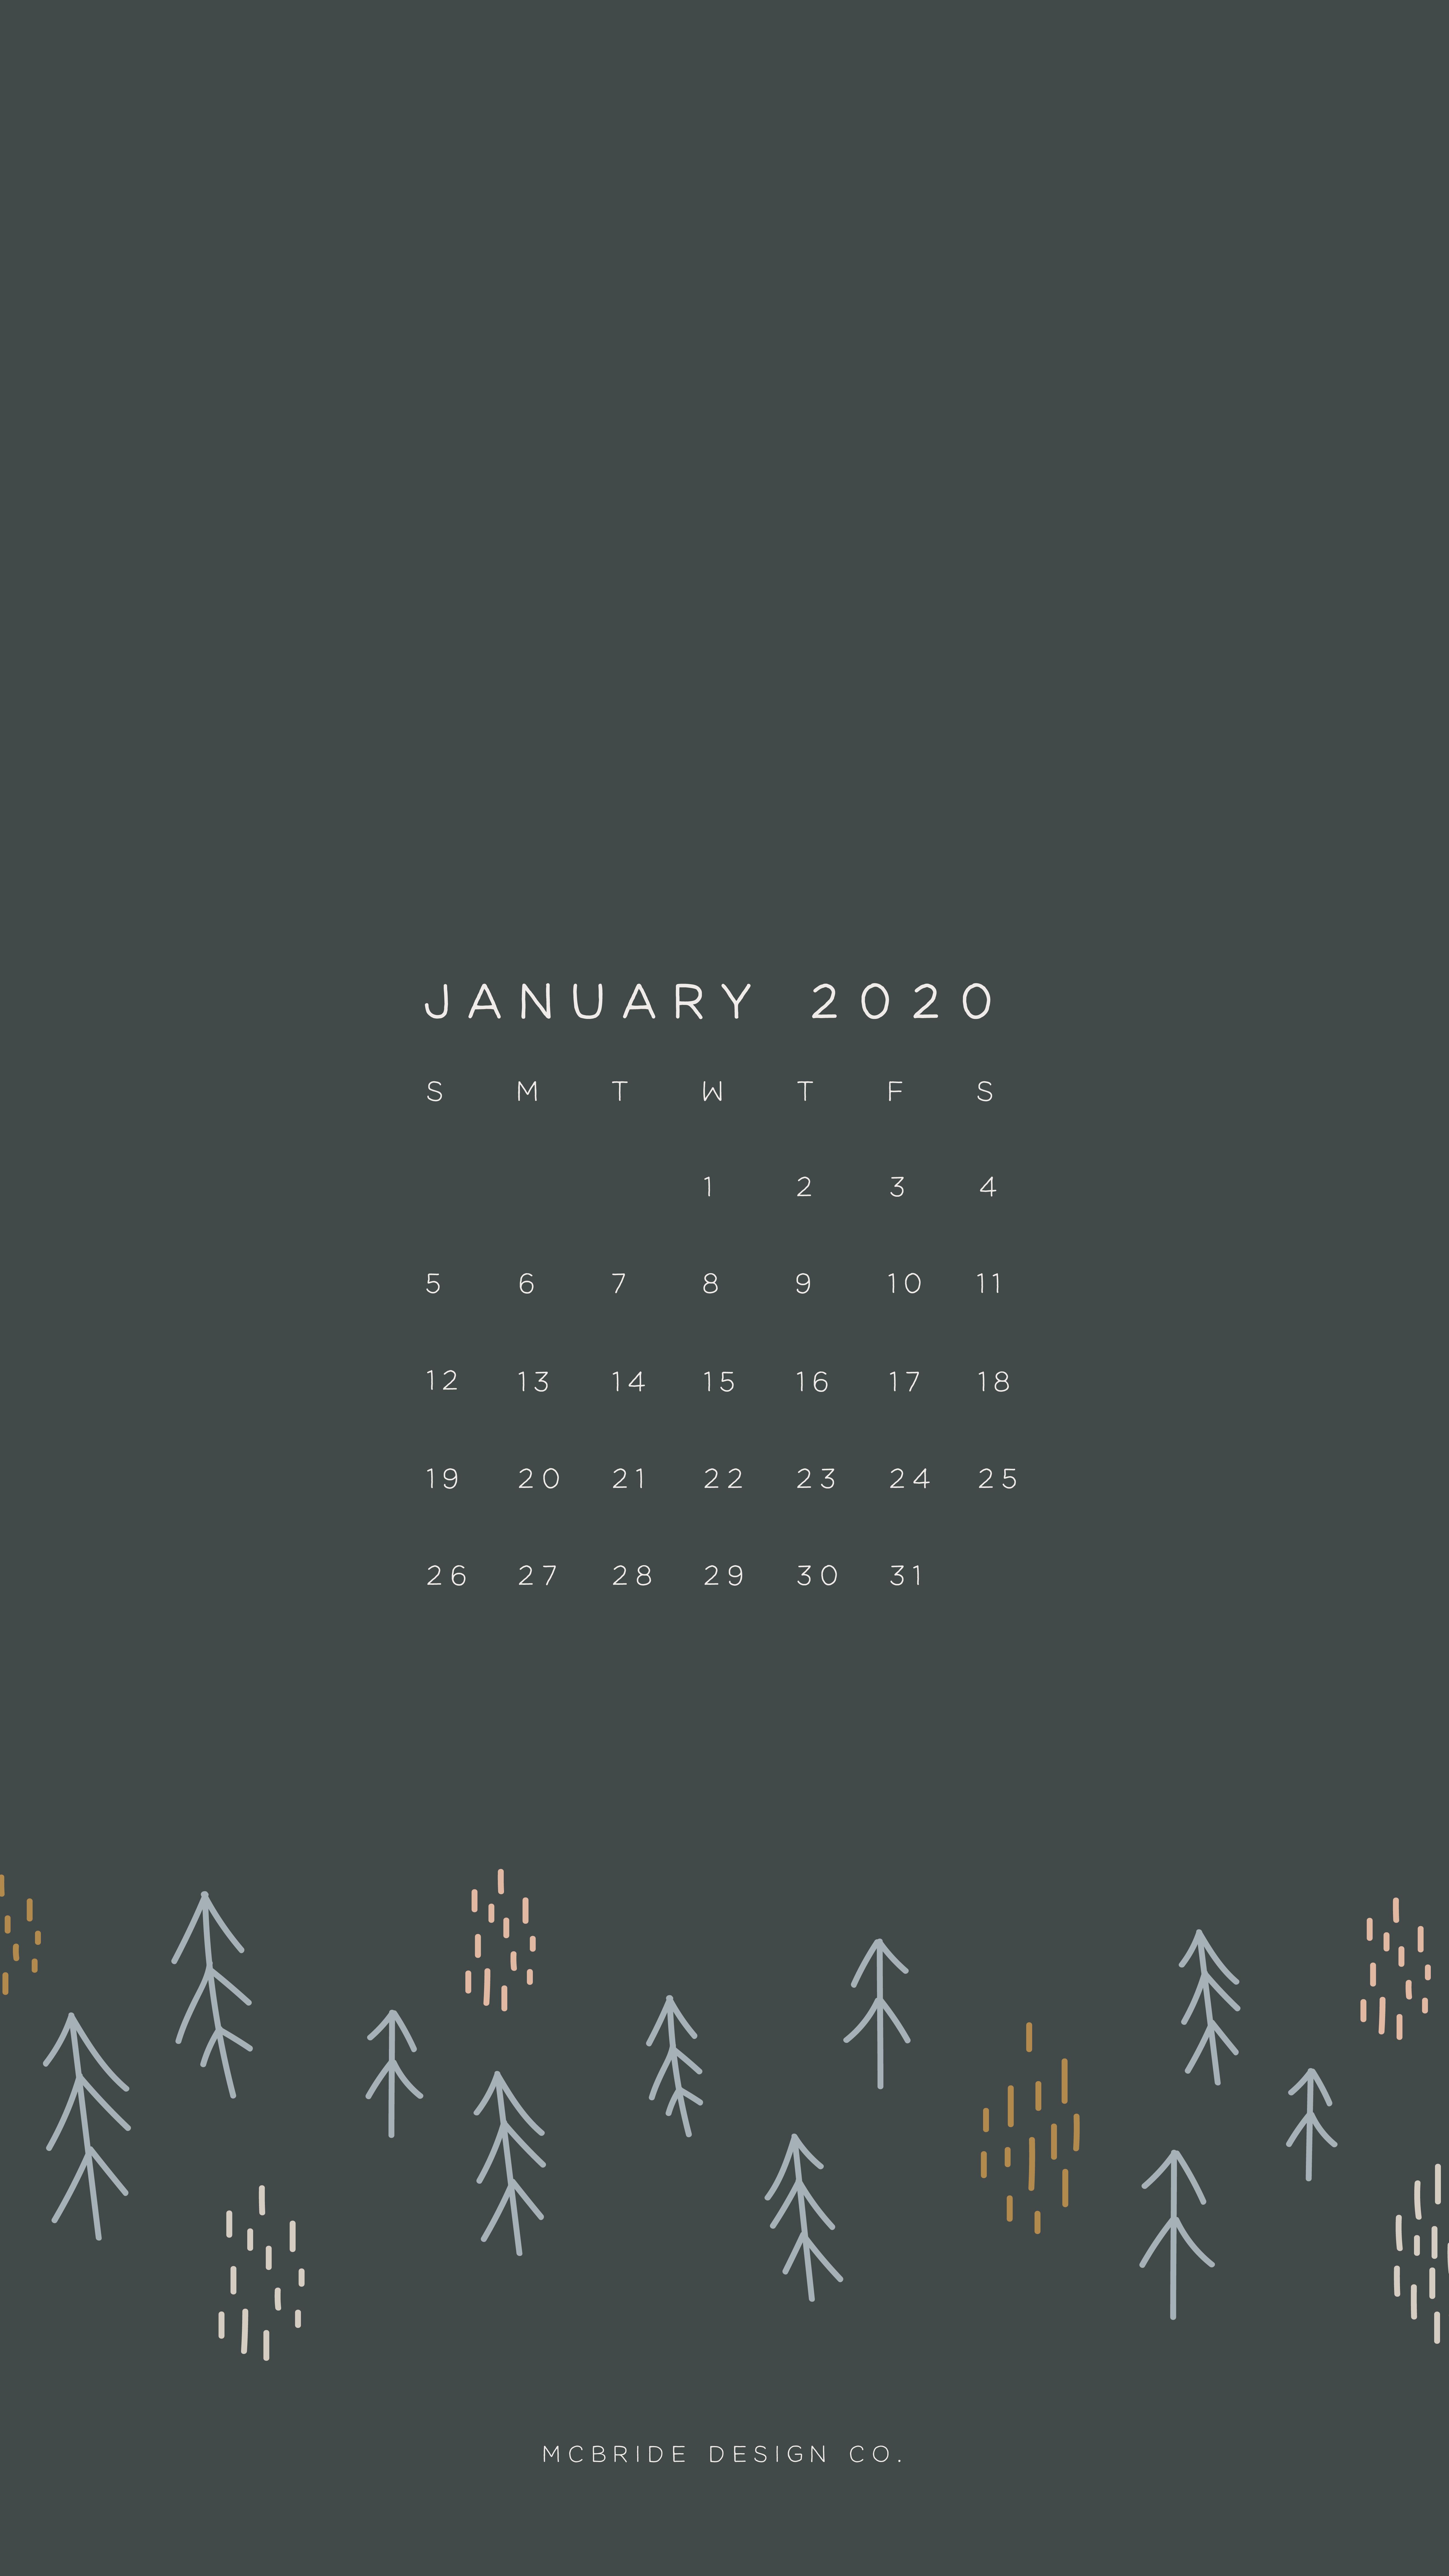 January 2020 Calendar Iphone Wallpaper Winter January Wallpaper Calendar Wallpaper